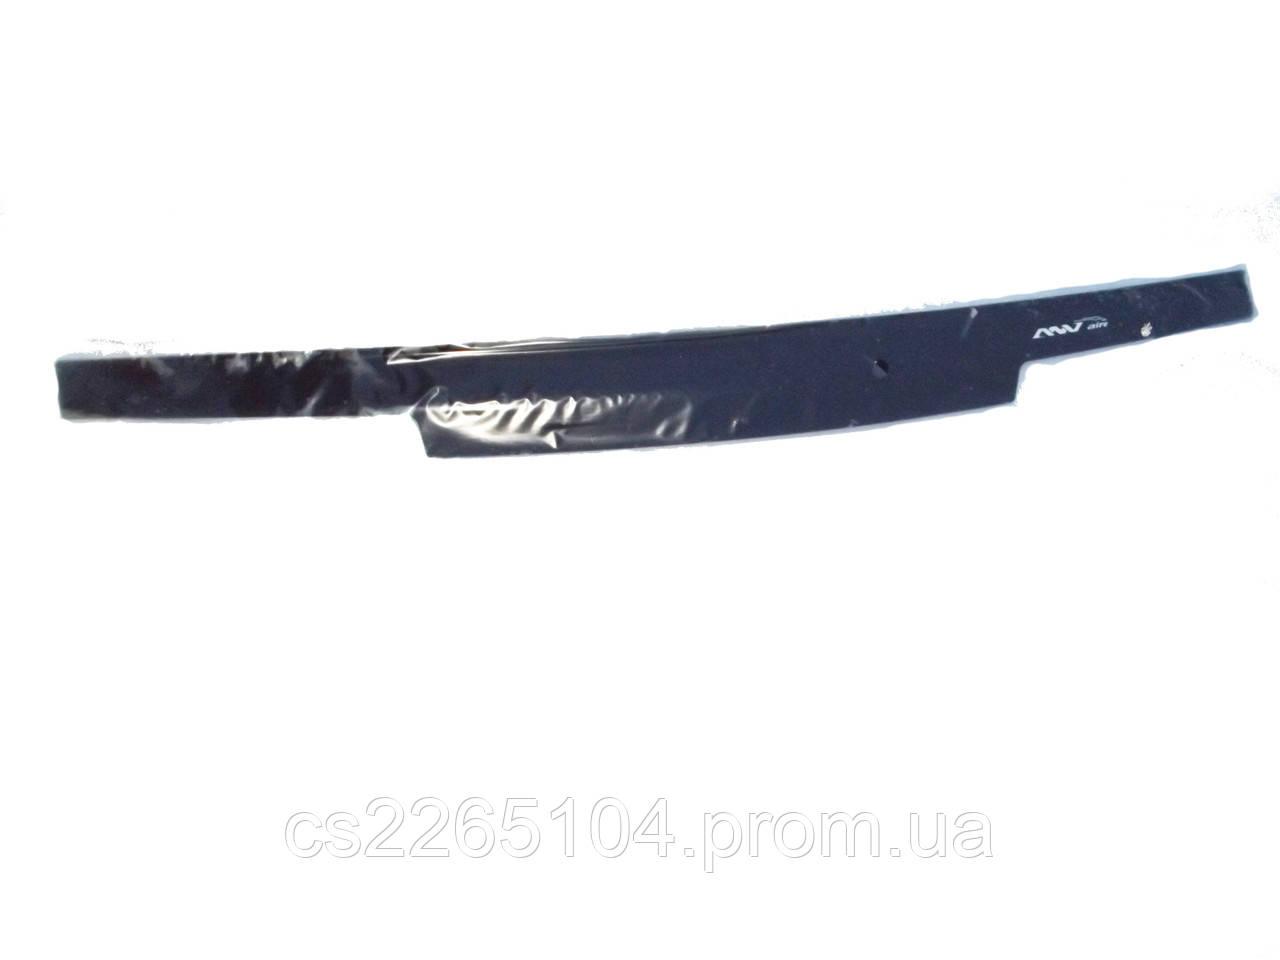 Дефлектор капота ВАЗ 2190 Гранта